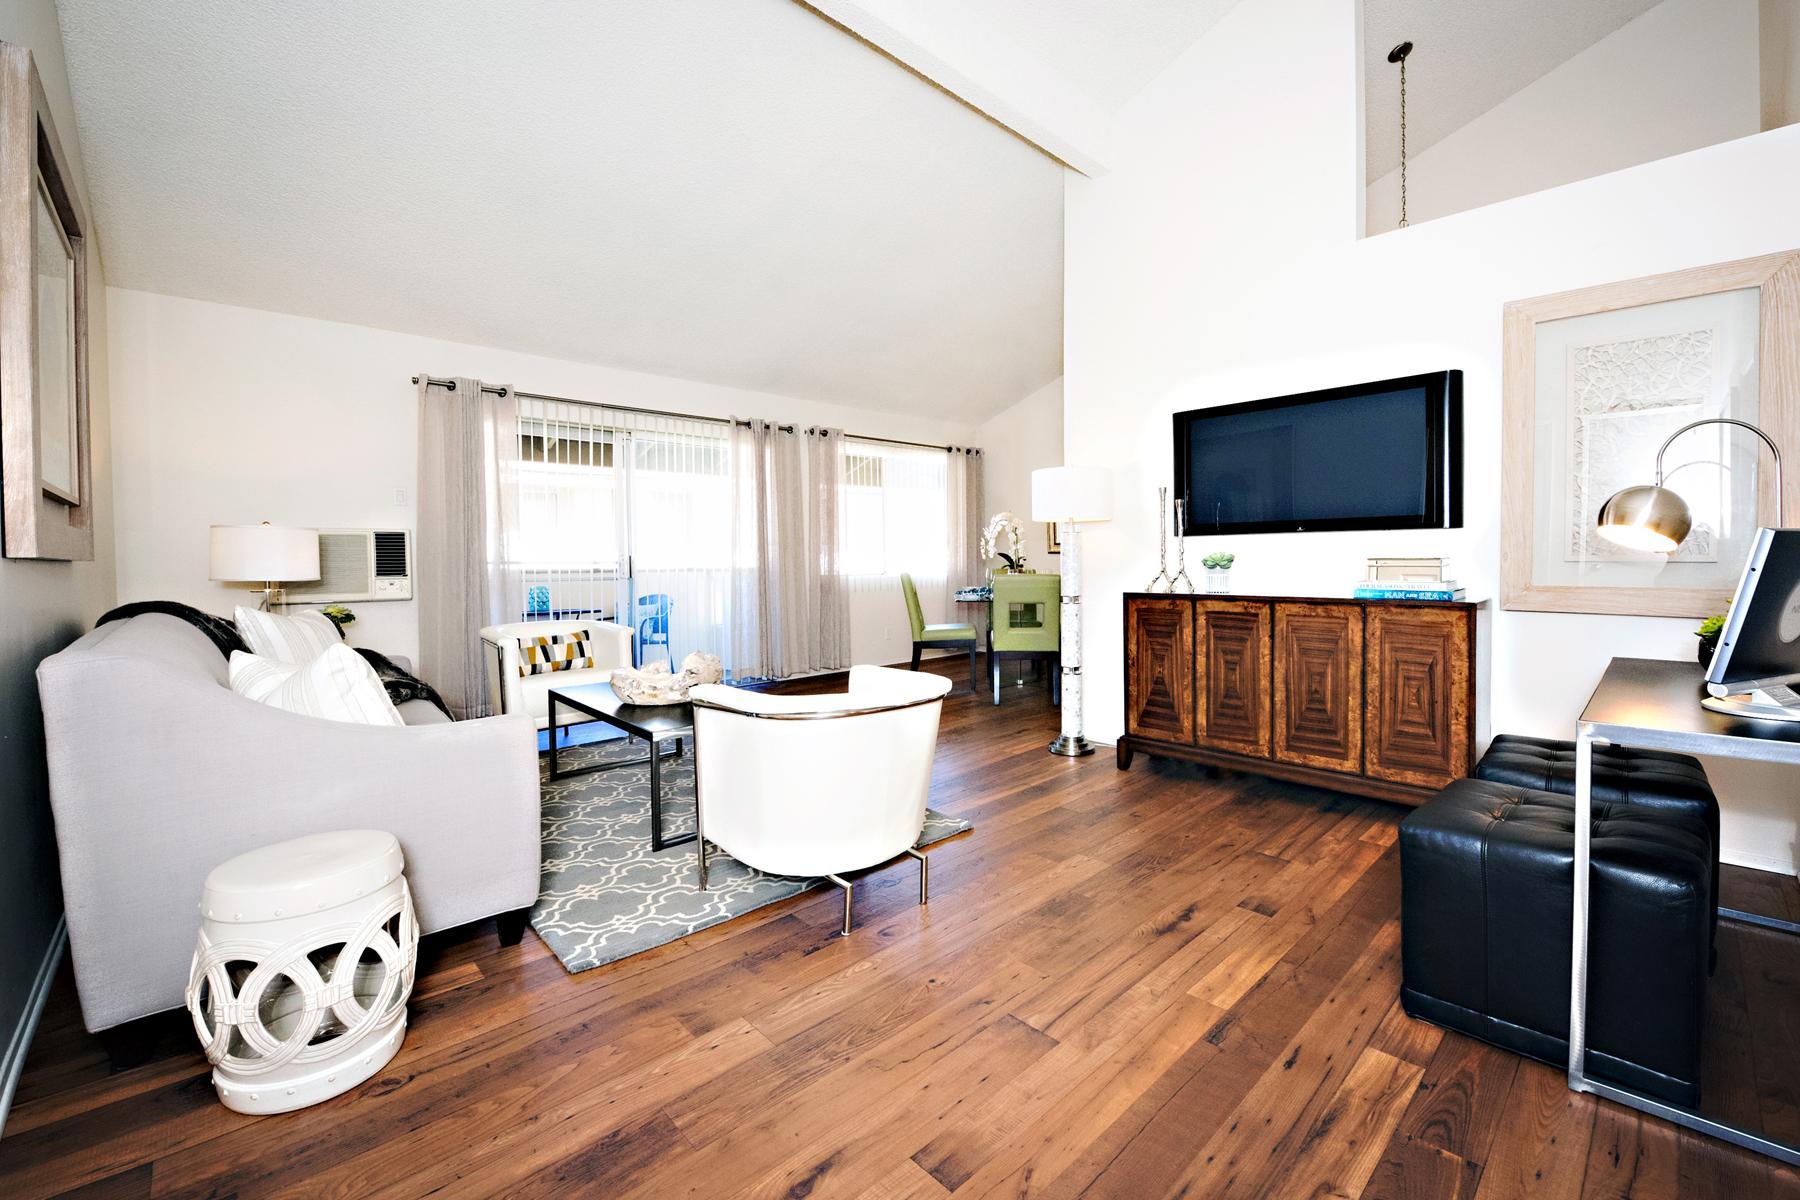 645 Hampshire Road #209, Westlake Village, CA - $3,035 USD/ month